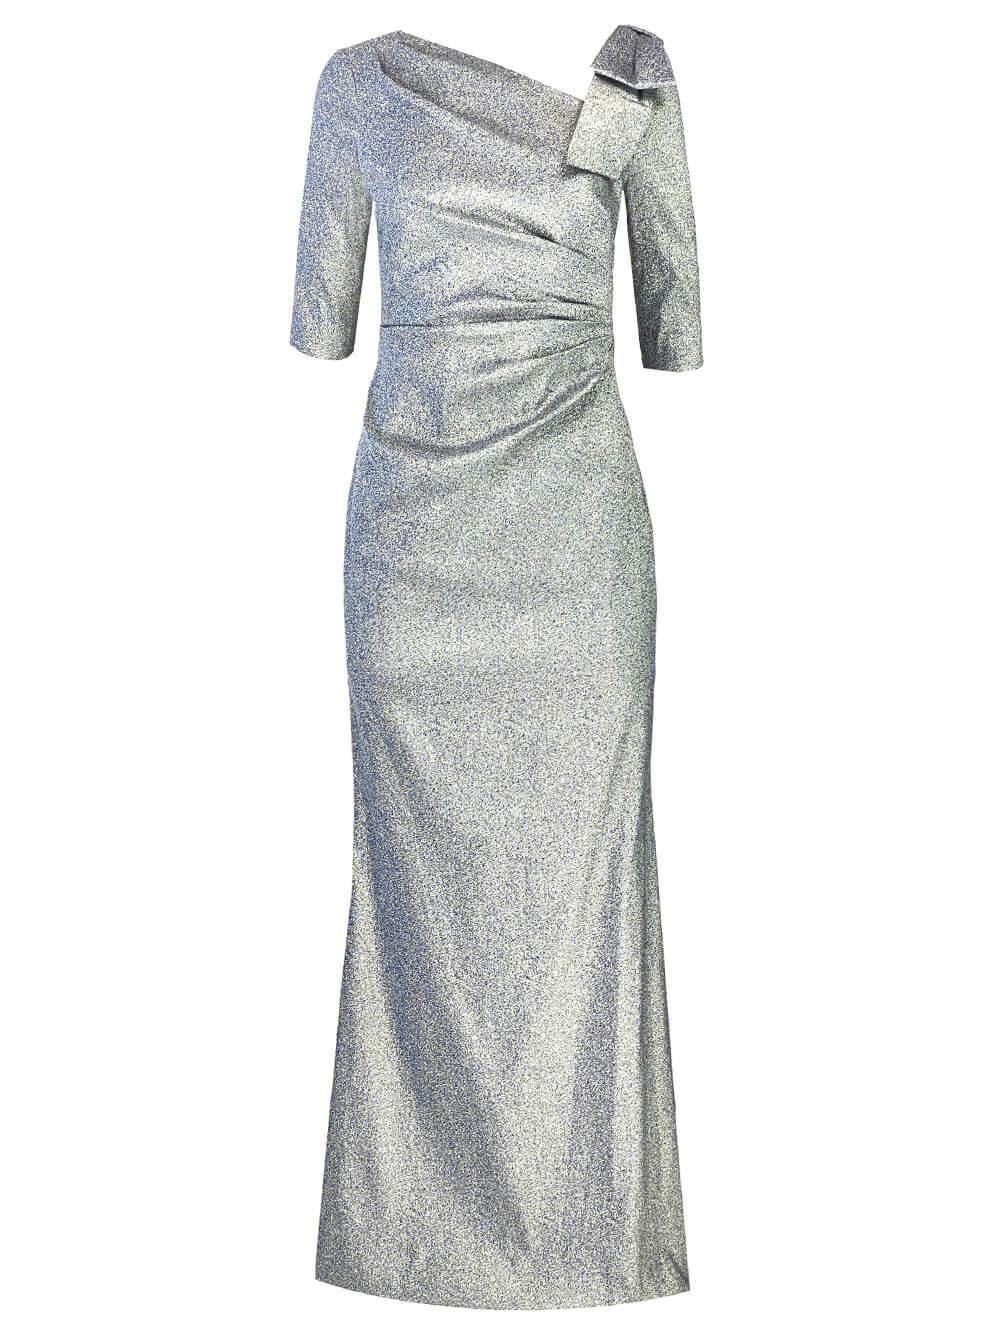 Stretch Metallic Bow Shoulder Gown Item # 219015